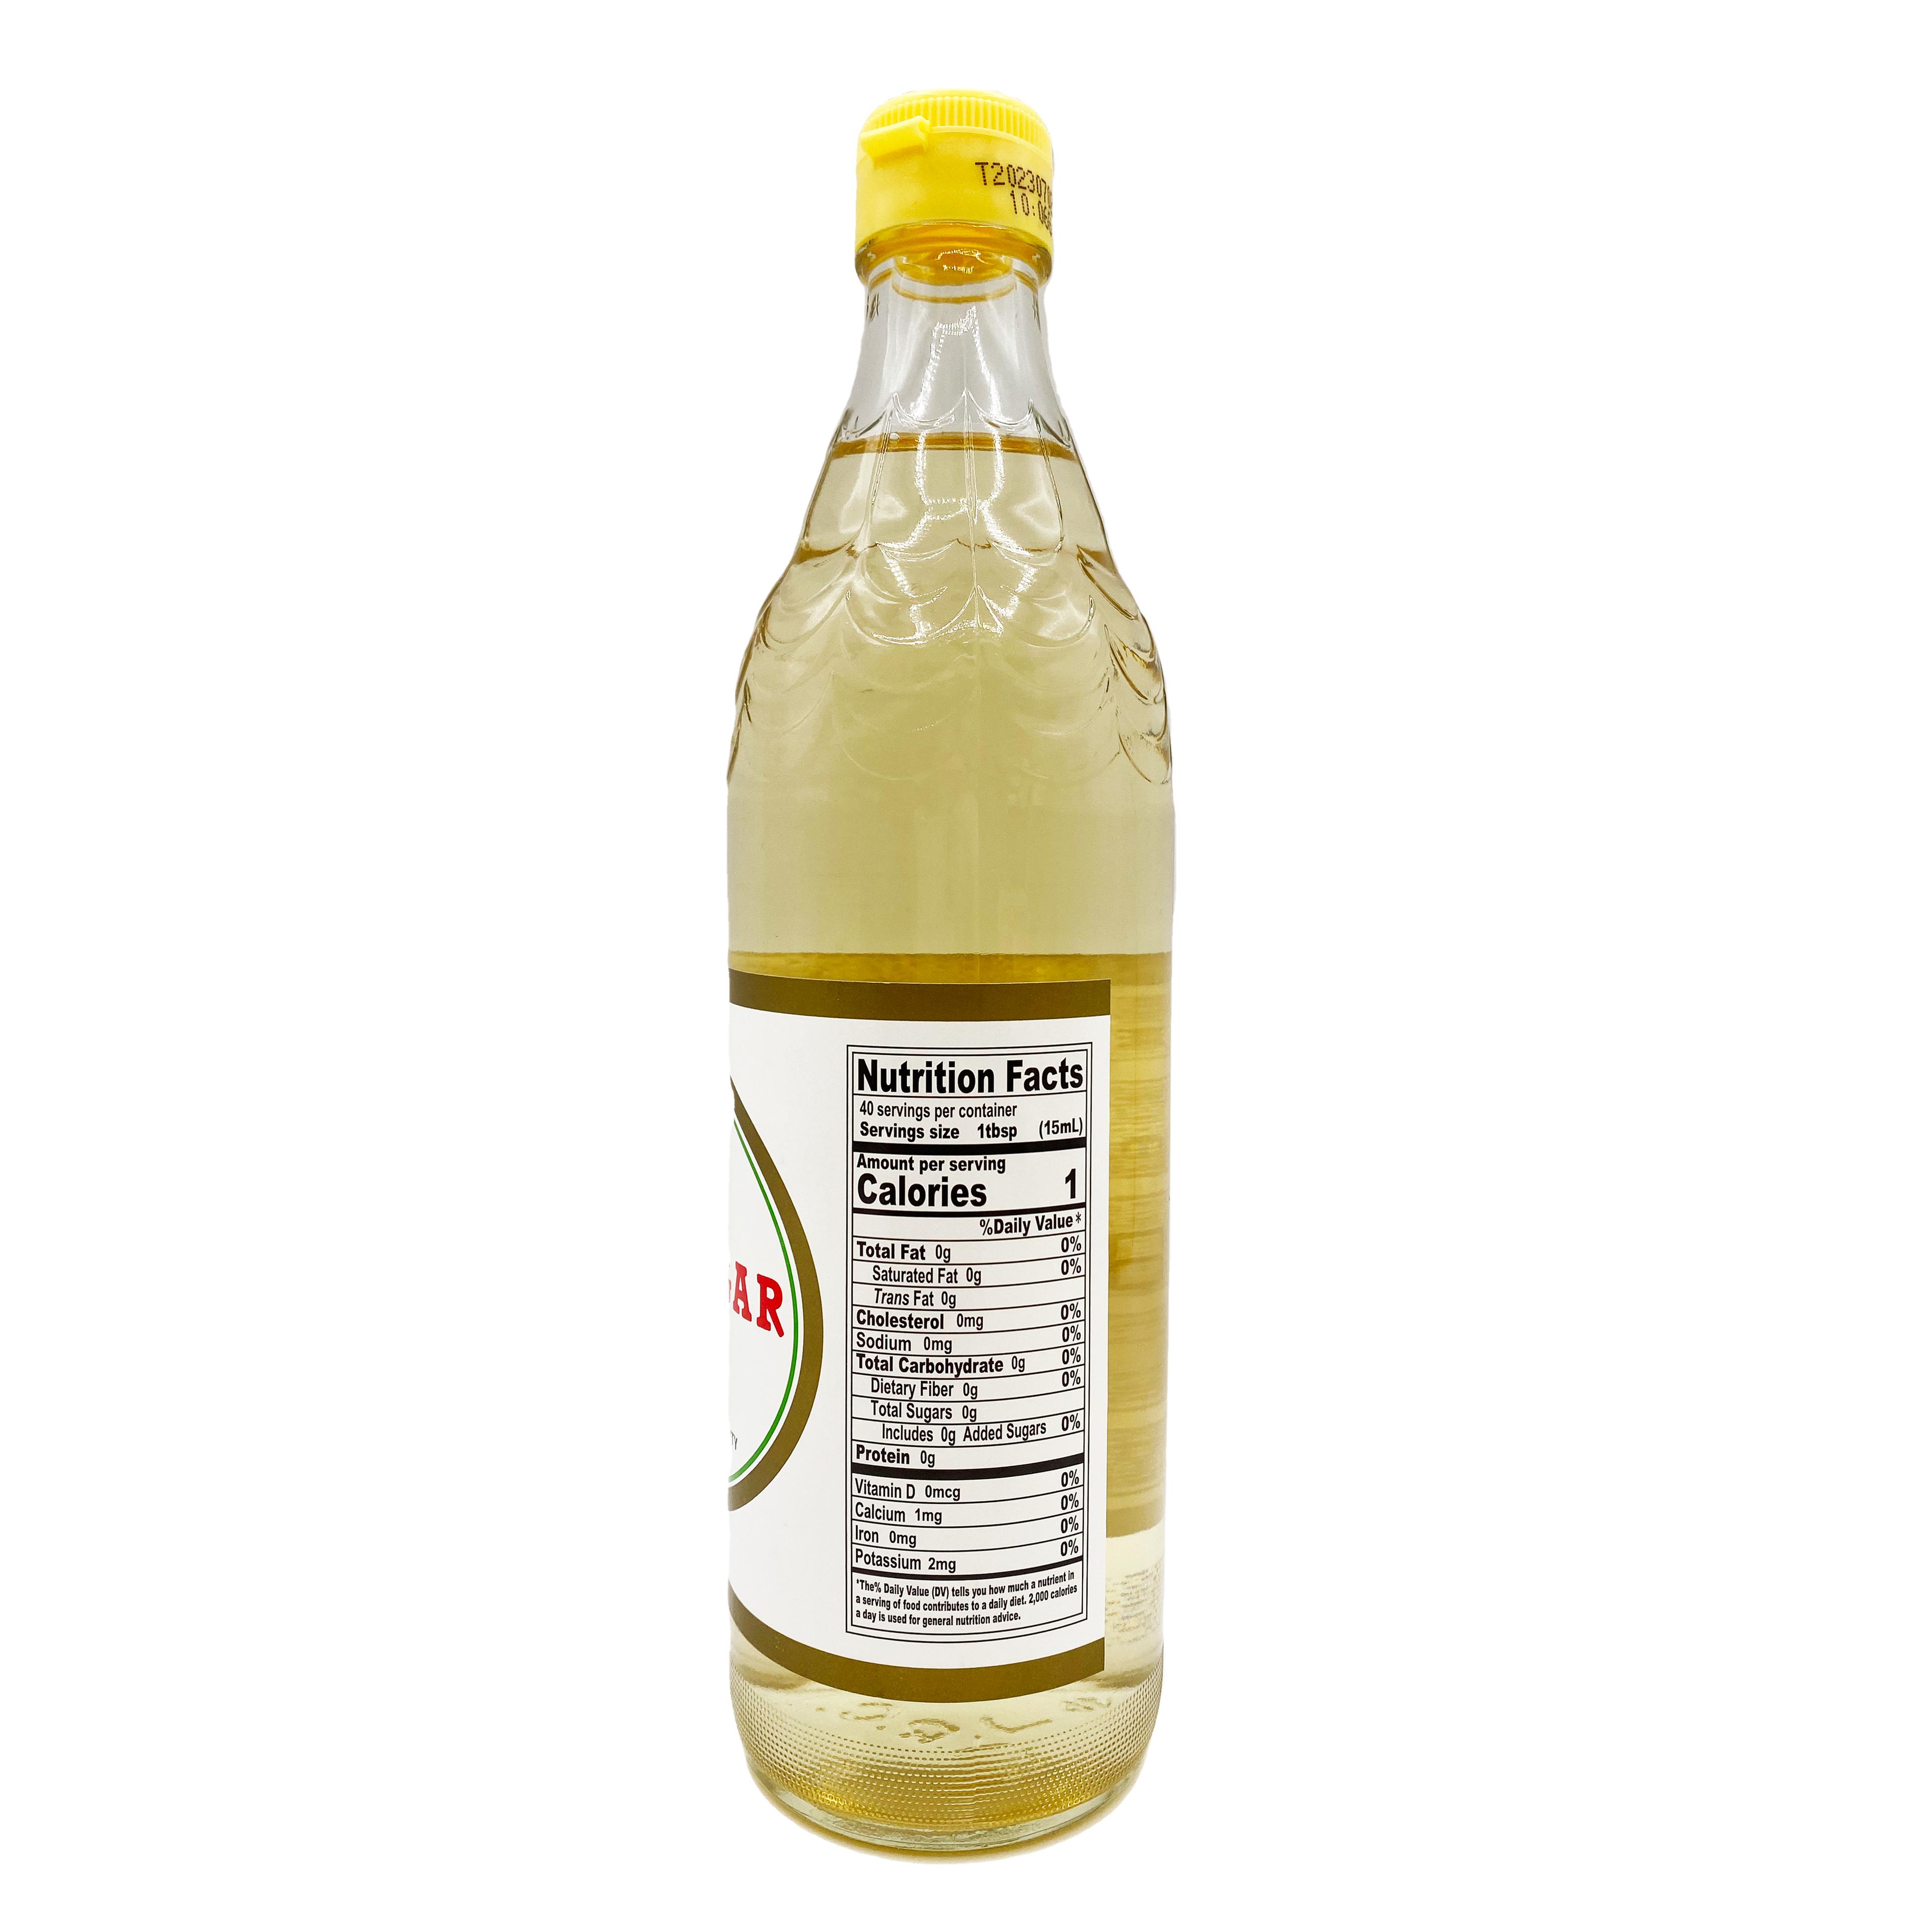 medium kong yen glutinous rice vinegar 202 fl oz 9ENrfpQAa4